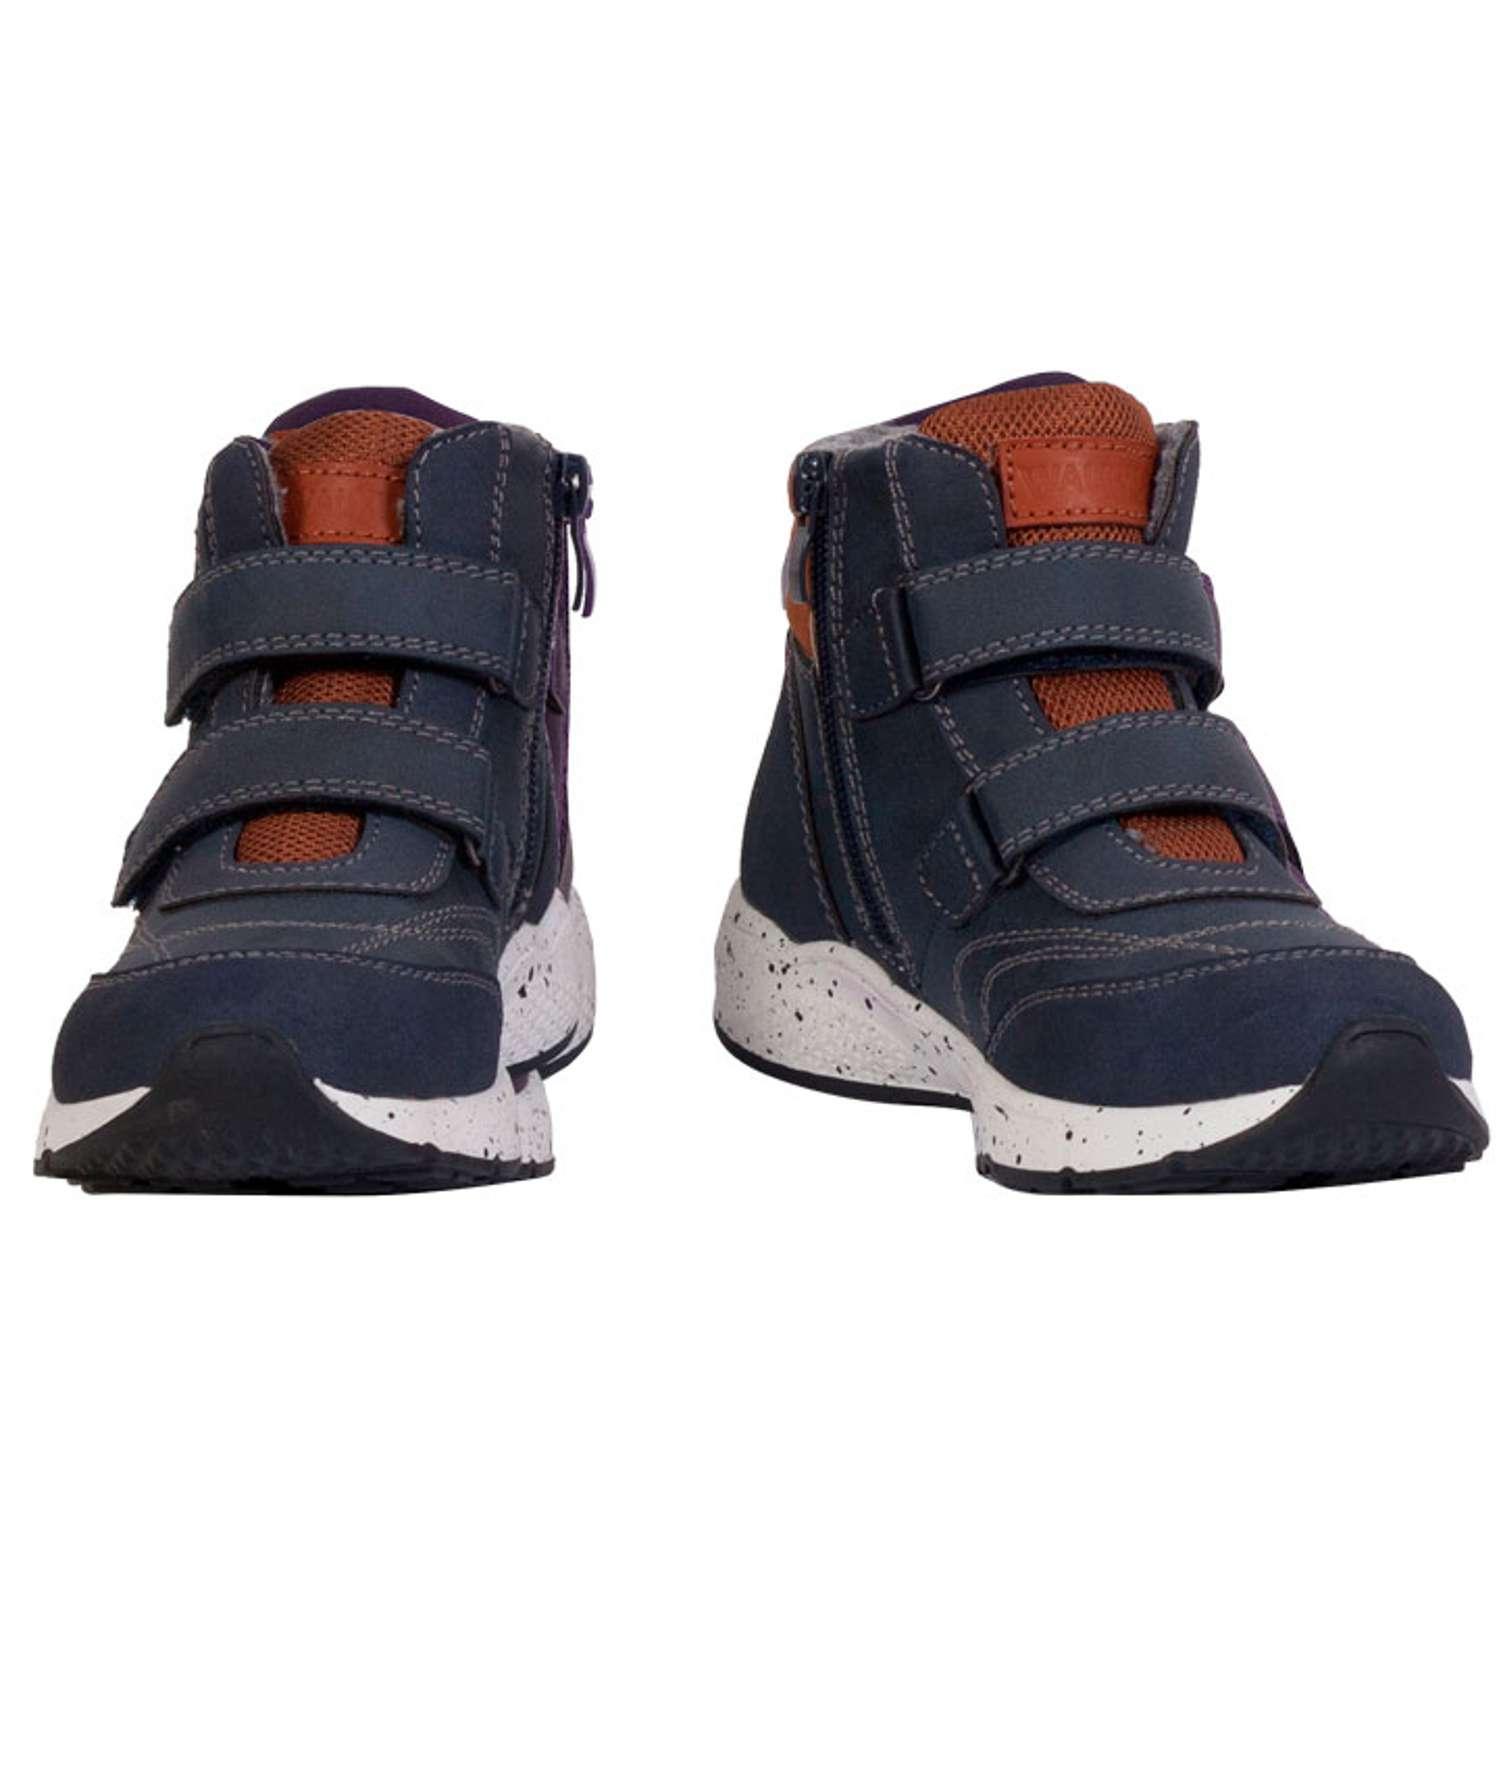 Walkway - Akako børne vinter sneakers - Mørkeblå - Størrelse 36